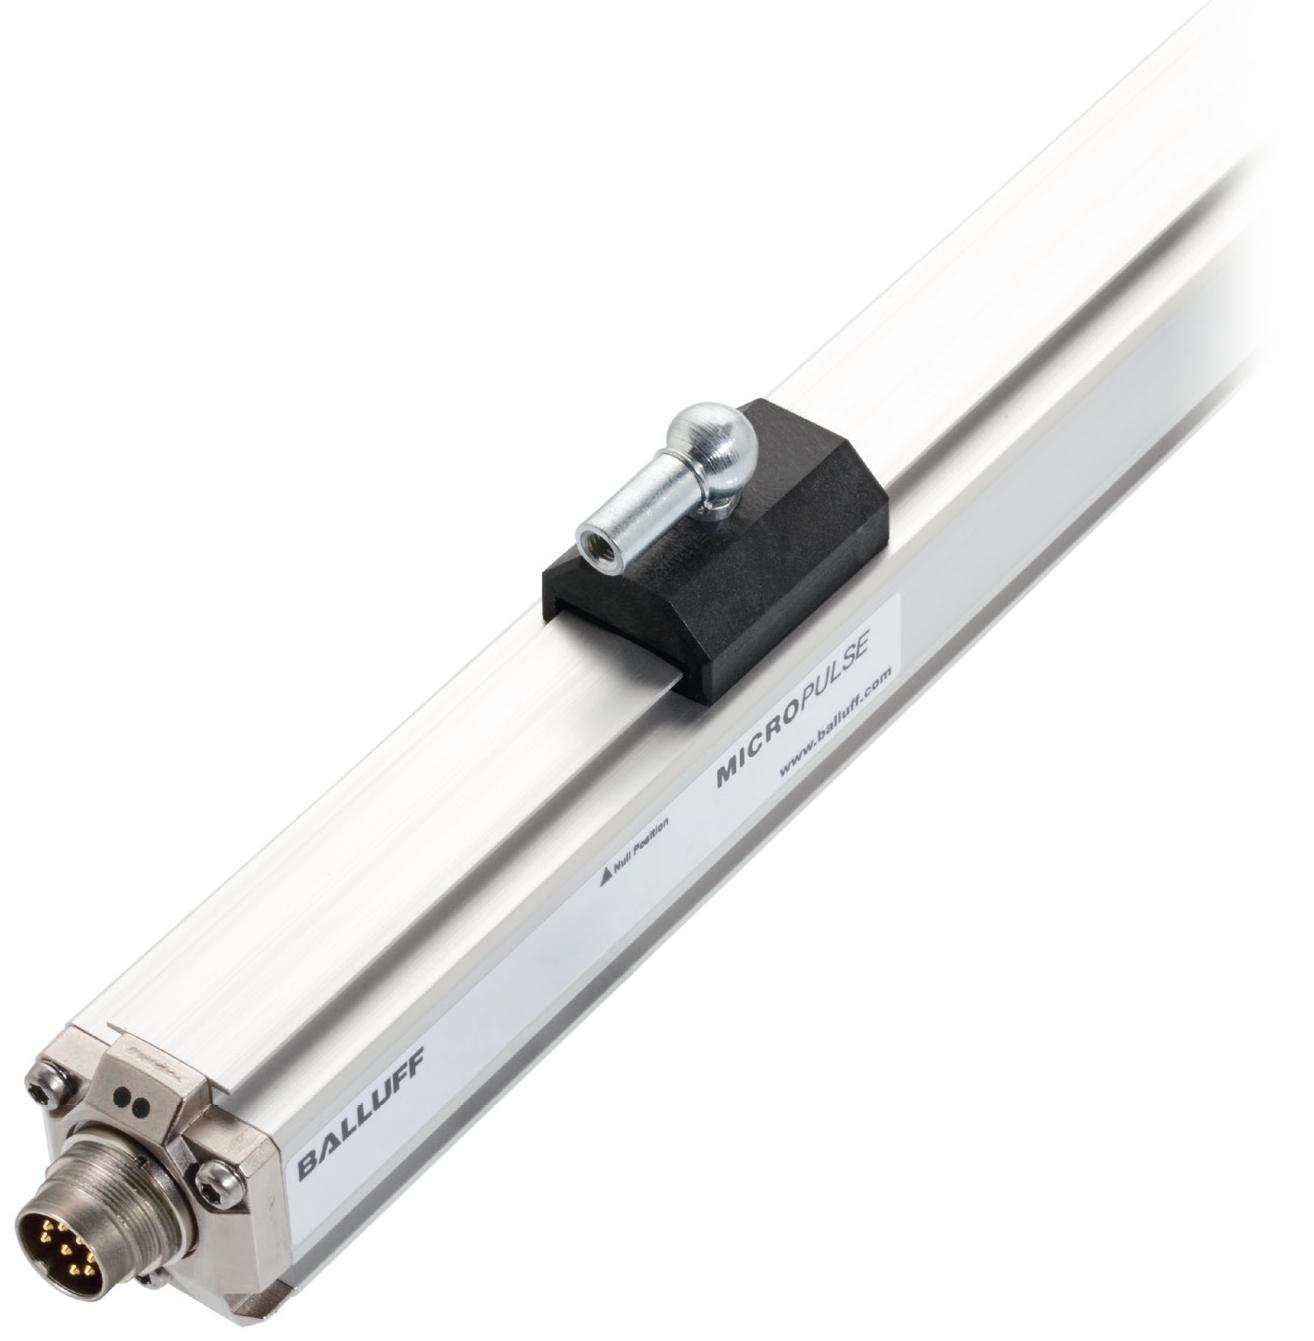 BTL7-A501-M0600-KA05 |Balluff| Micropulse+ Transducer